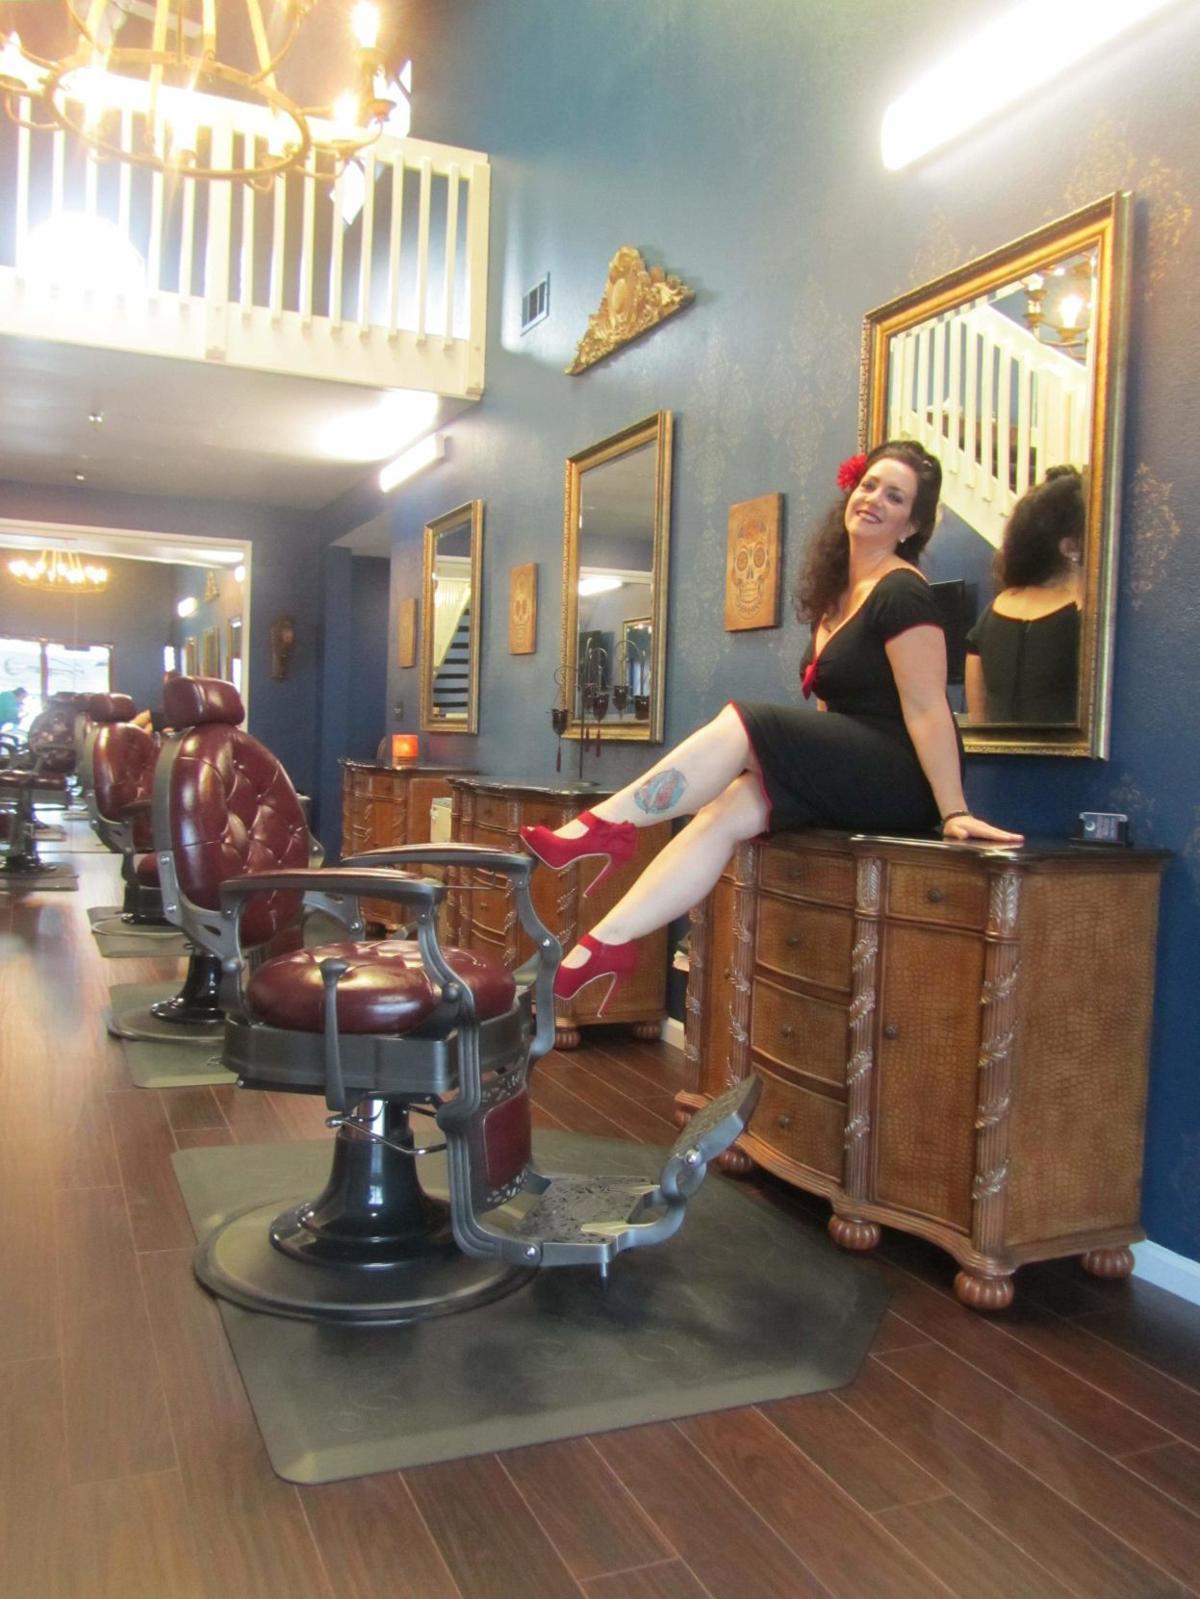 Julie Crisci is the owner of Napa's Moonlight BarberShop.